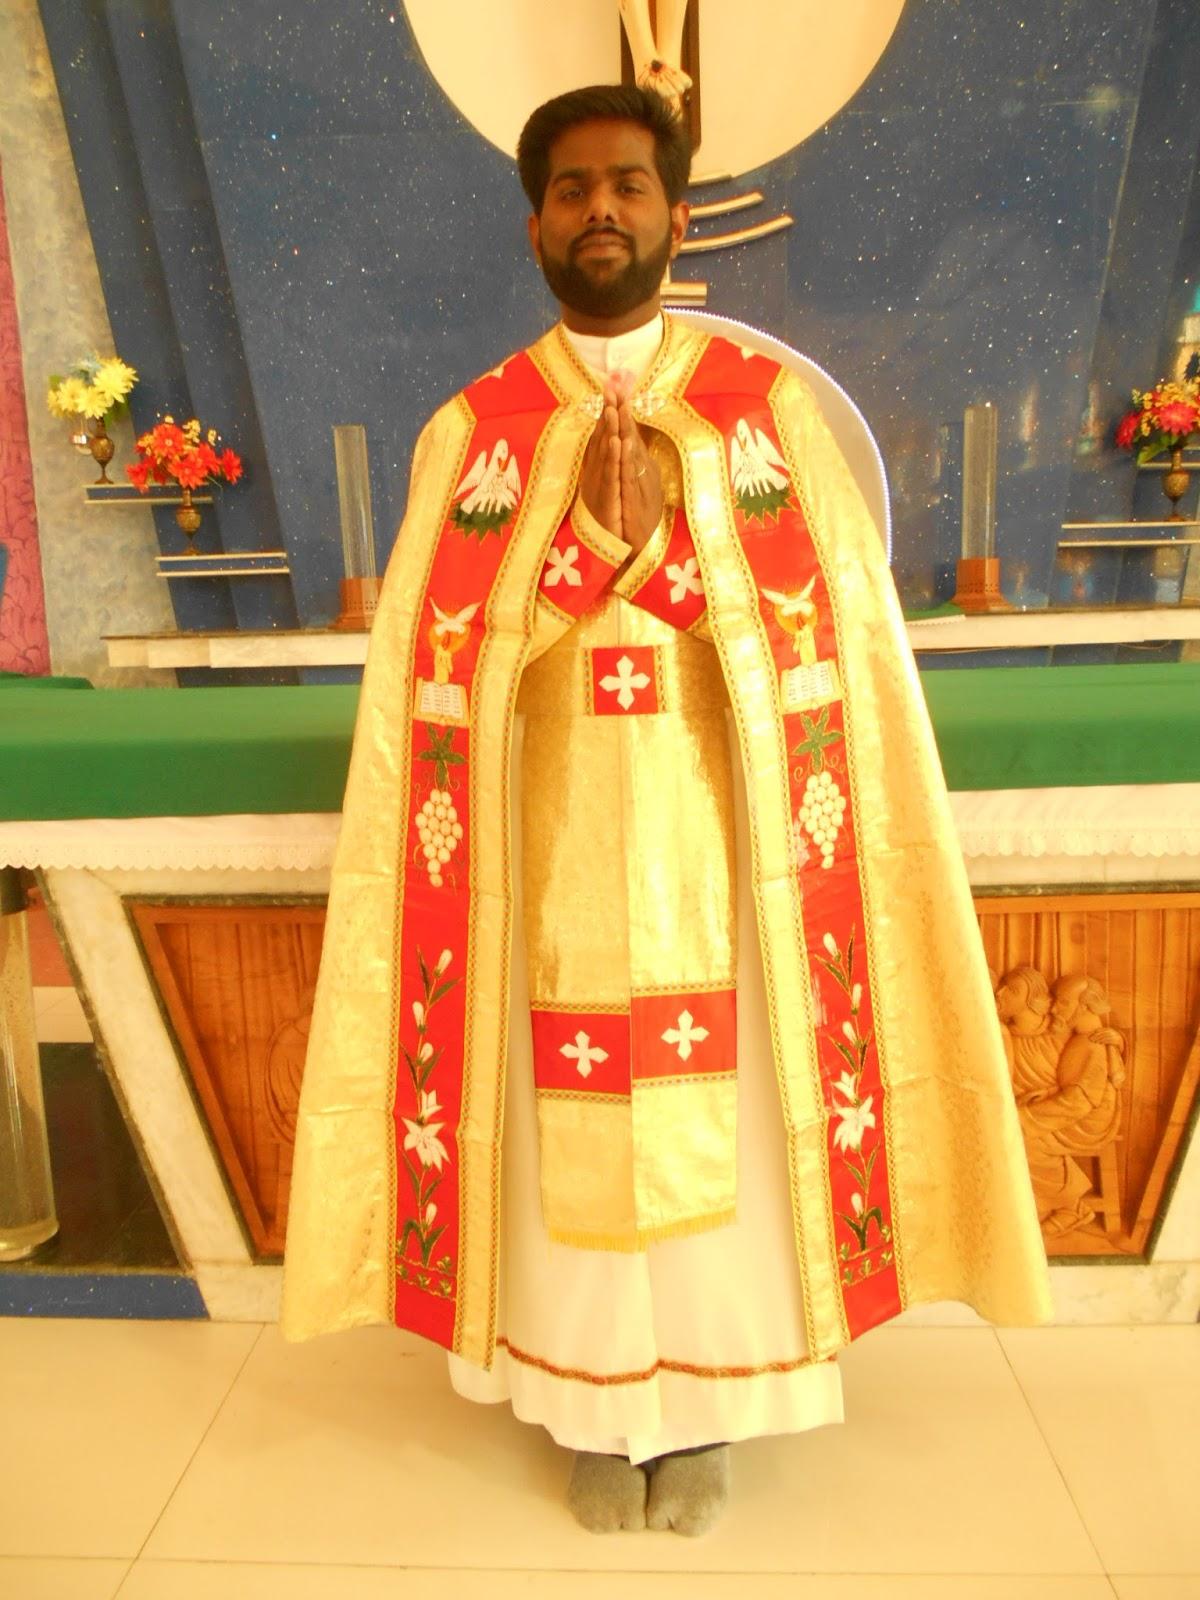 DIOCESE OF SAGAR: Deacon Jose Maripurath was ordained priest